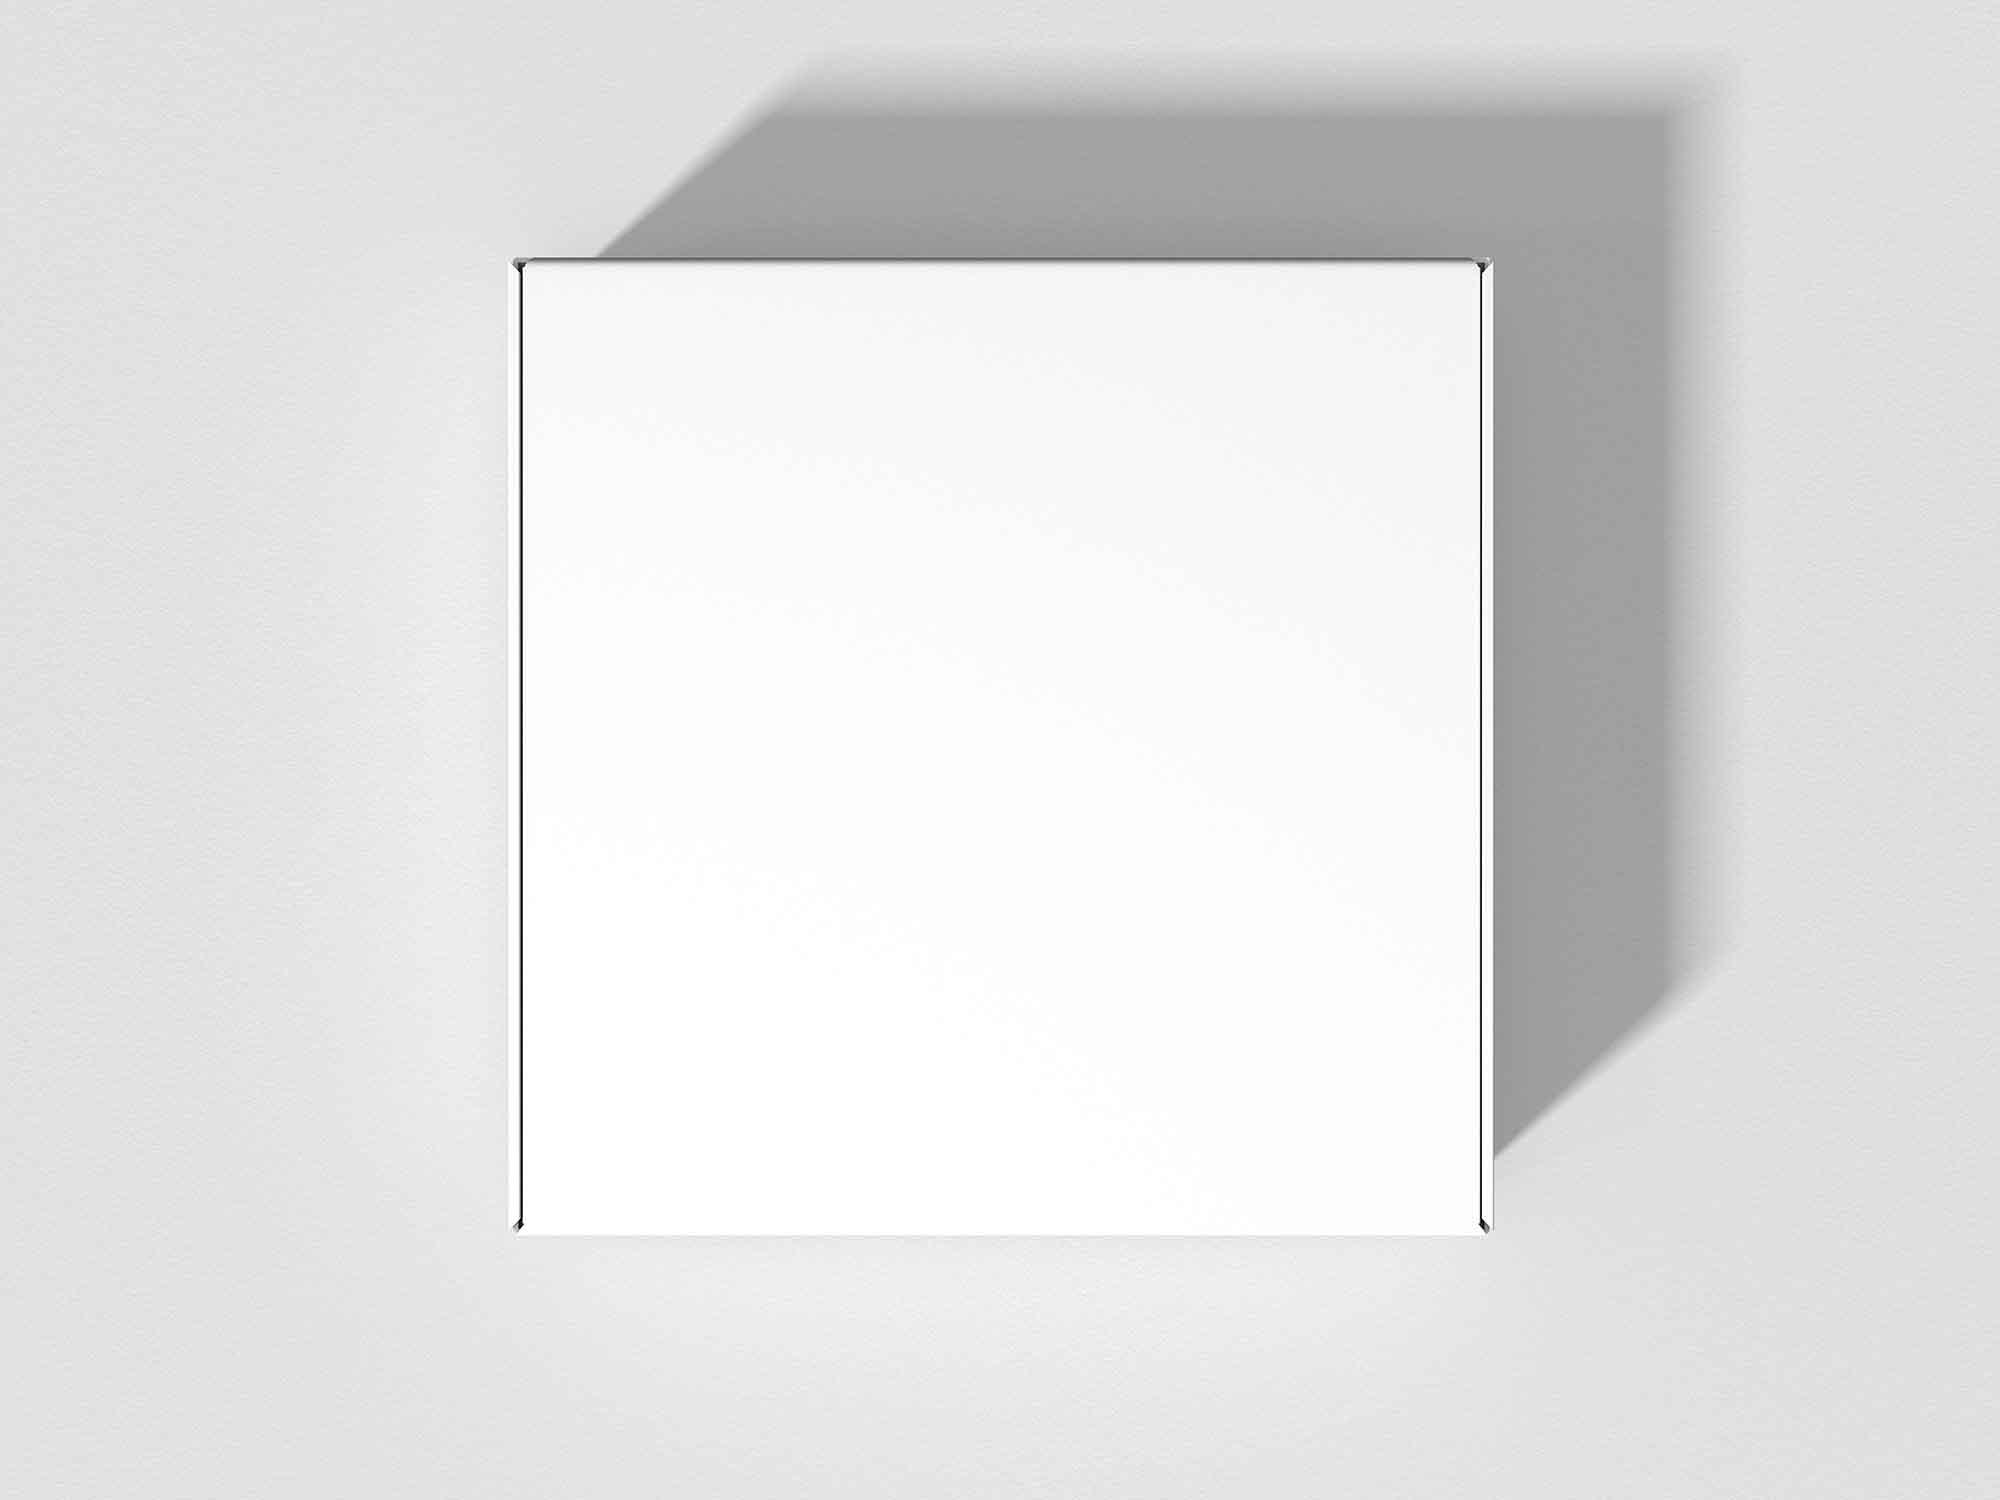 Mailer Box Mockup 2